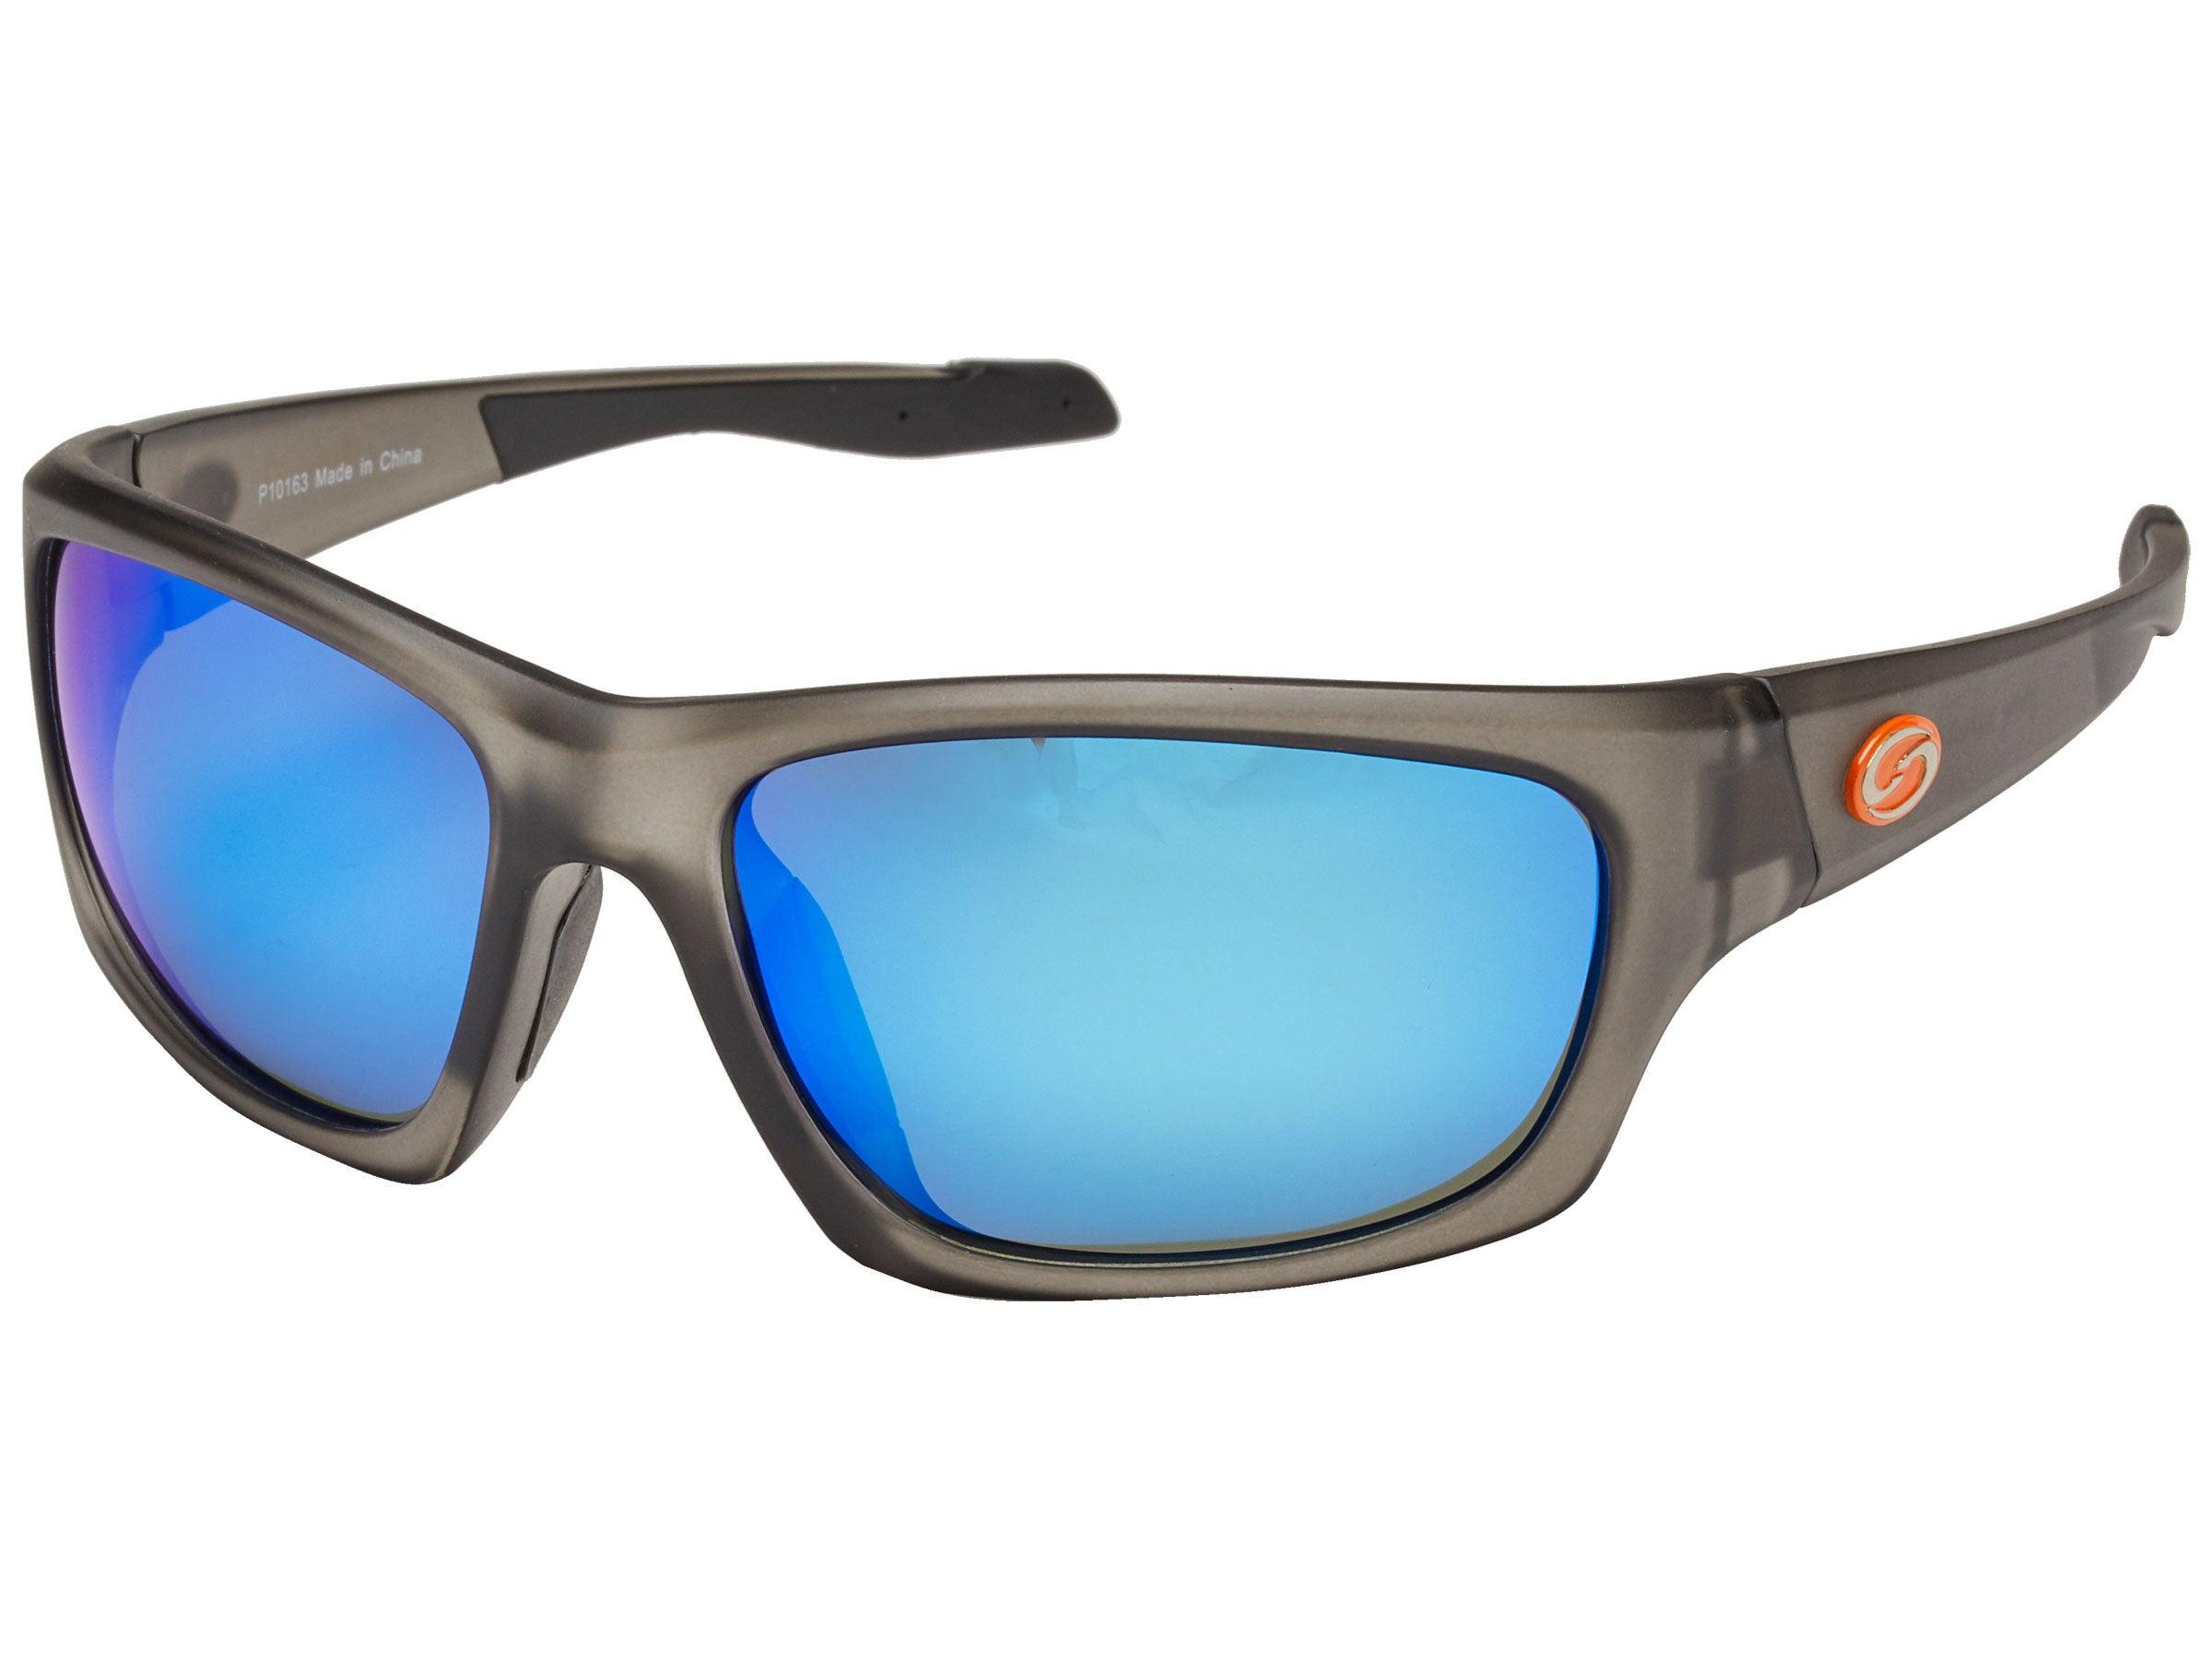 357c3b430f Strike King Plus Polarized Sunglasses